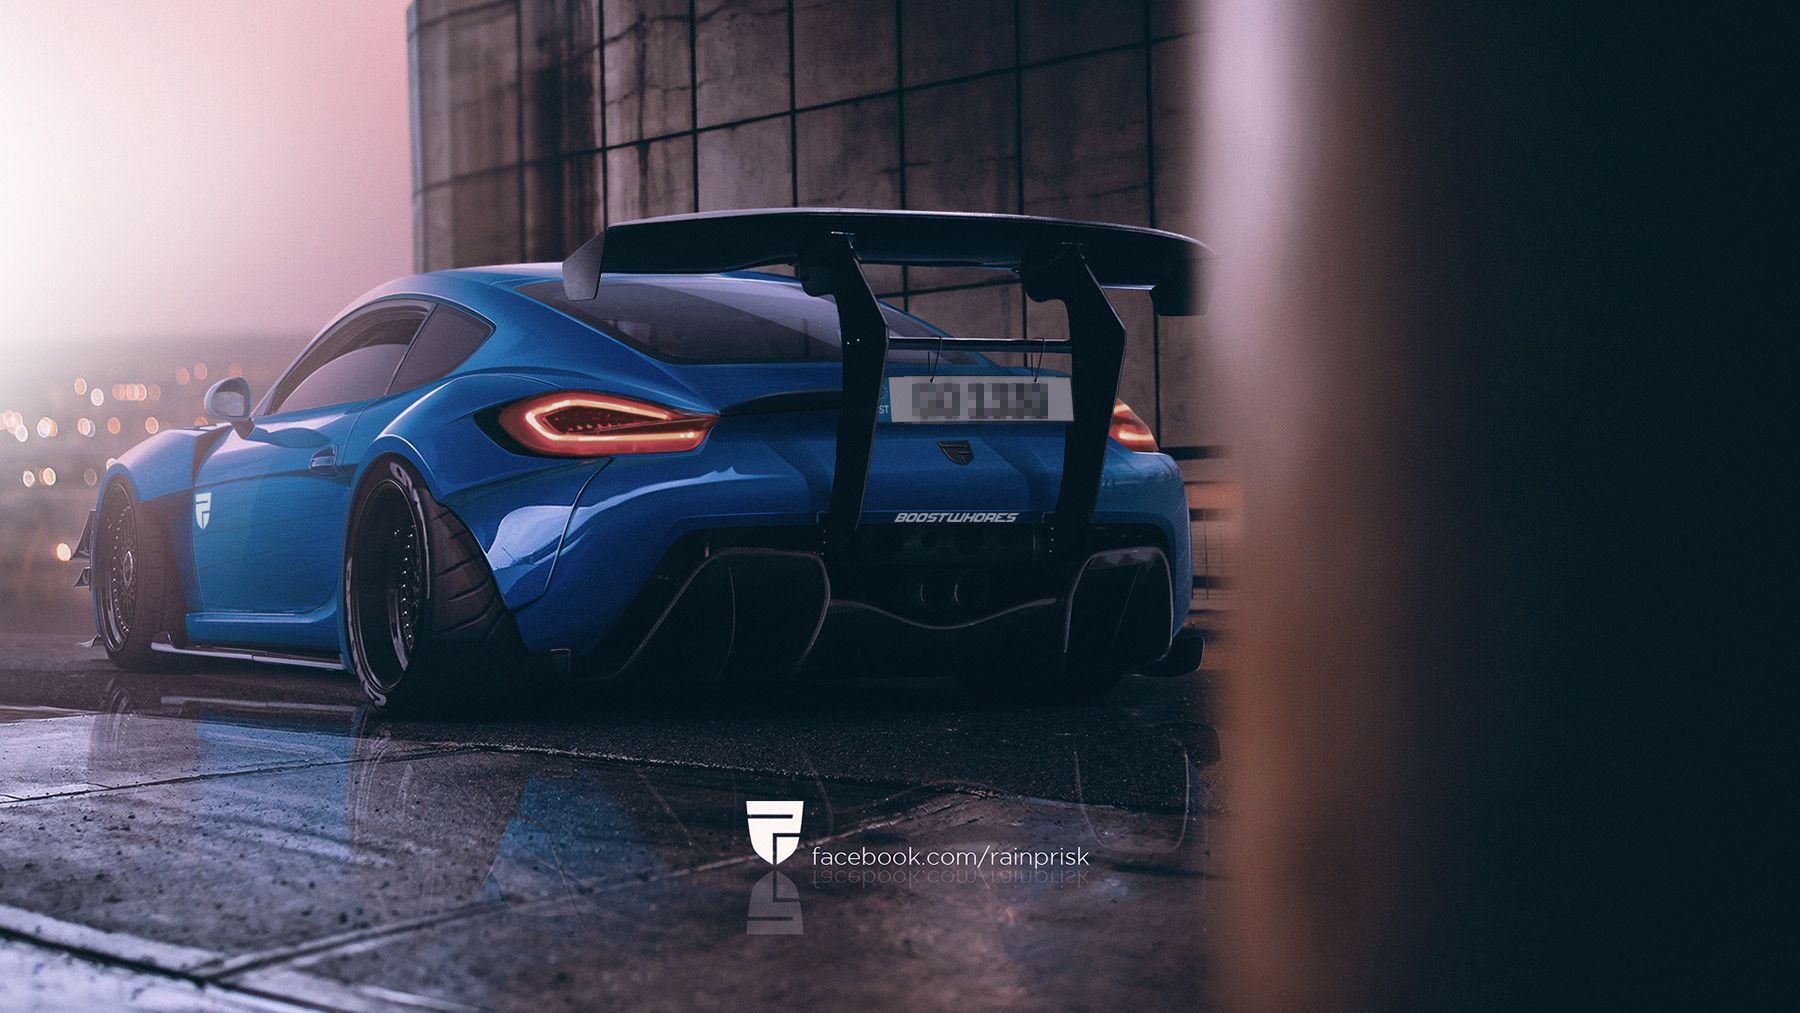 Monster Porsche Hurricane Concept Design: Fat Monster Porsche Cayman, Rain Prisk